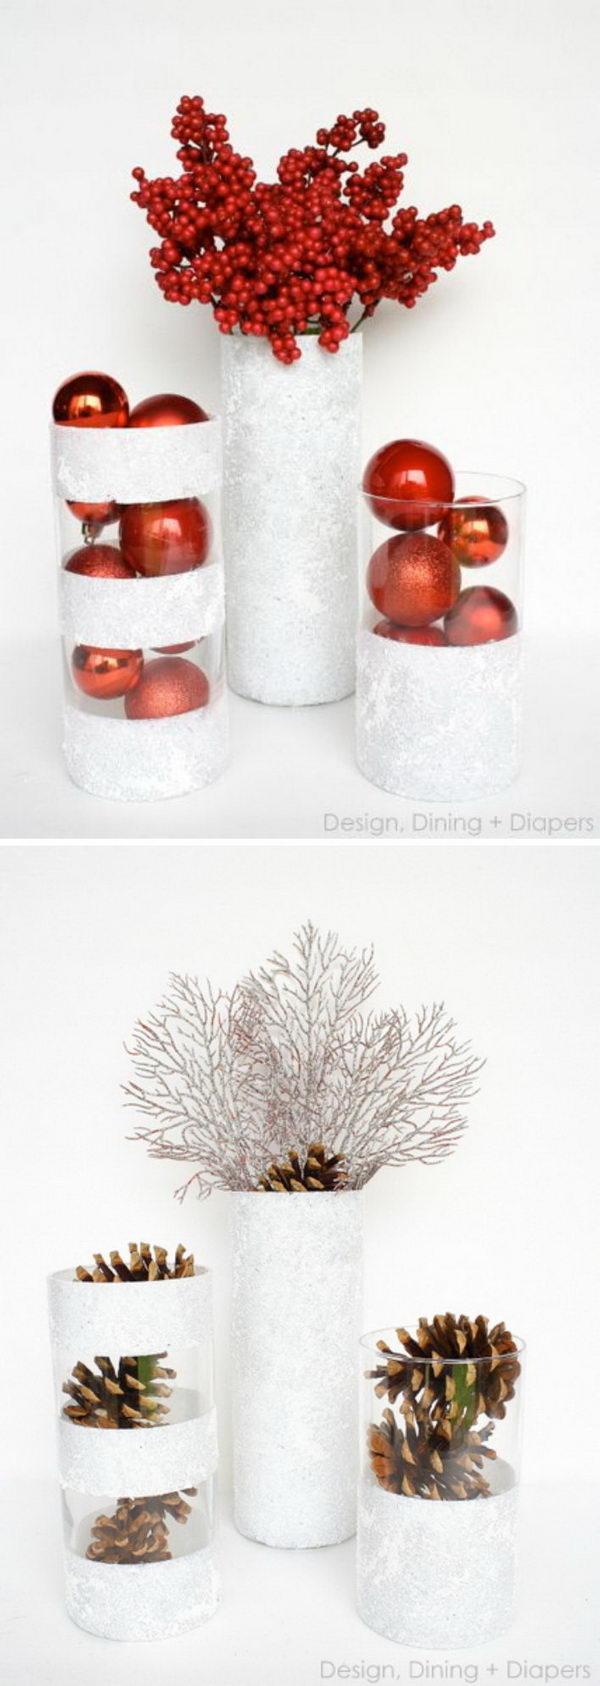 16. Christmas Vases